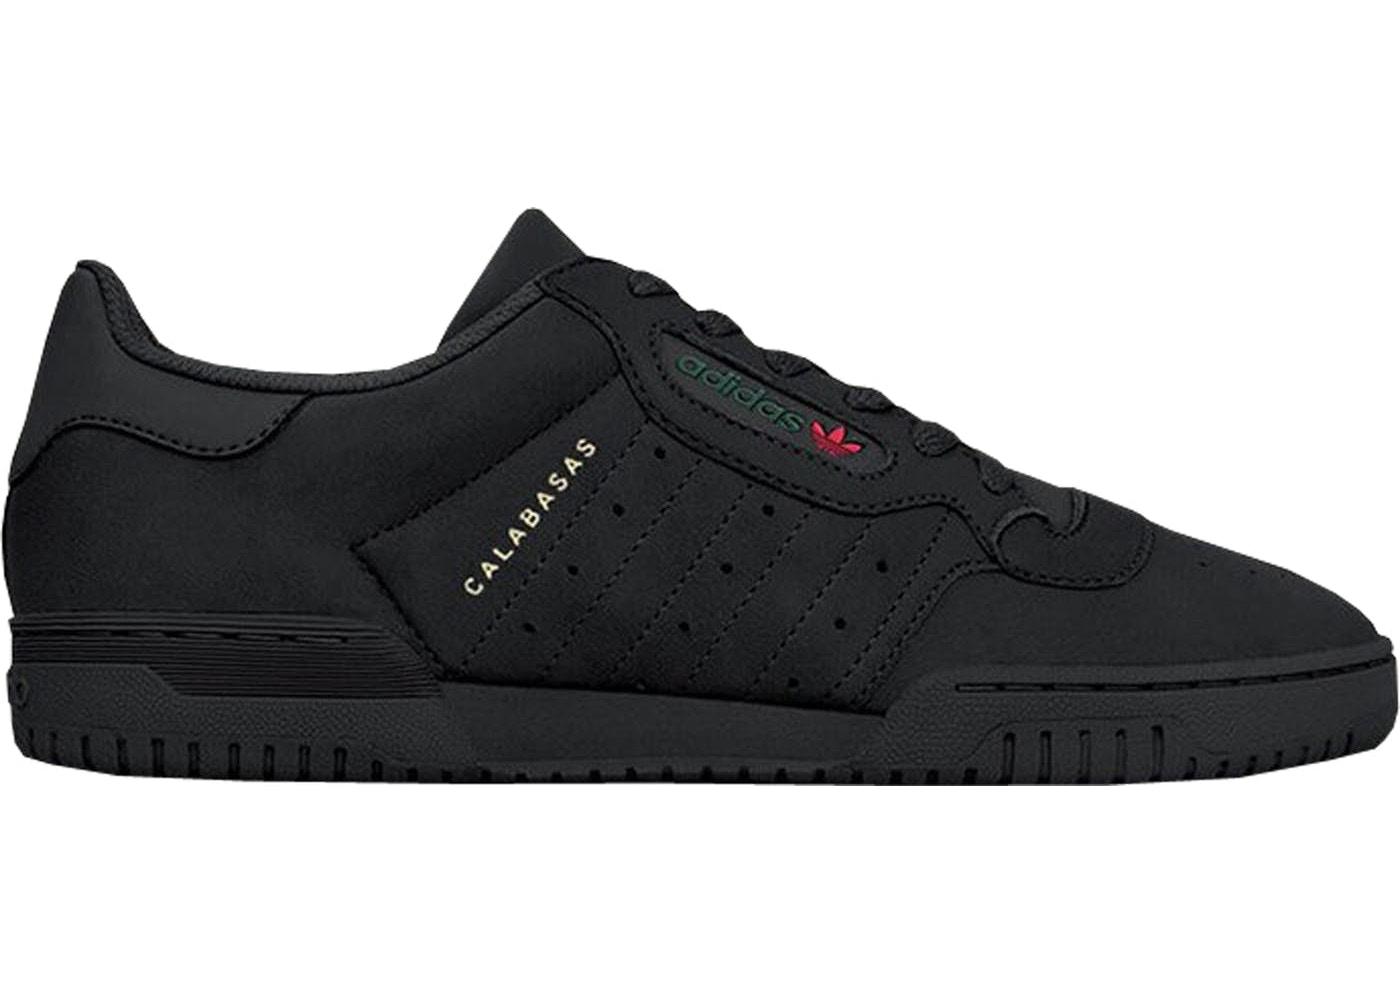 Men's Adidas Yeezy Powerphase Calabasas Core Black Size 11 Authentic